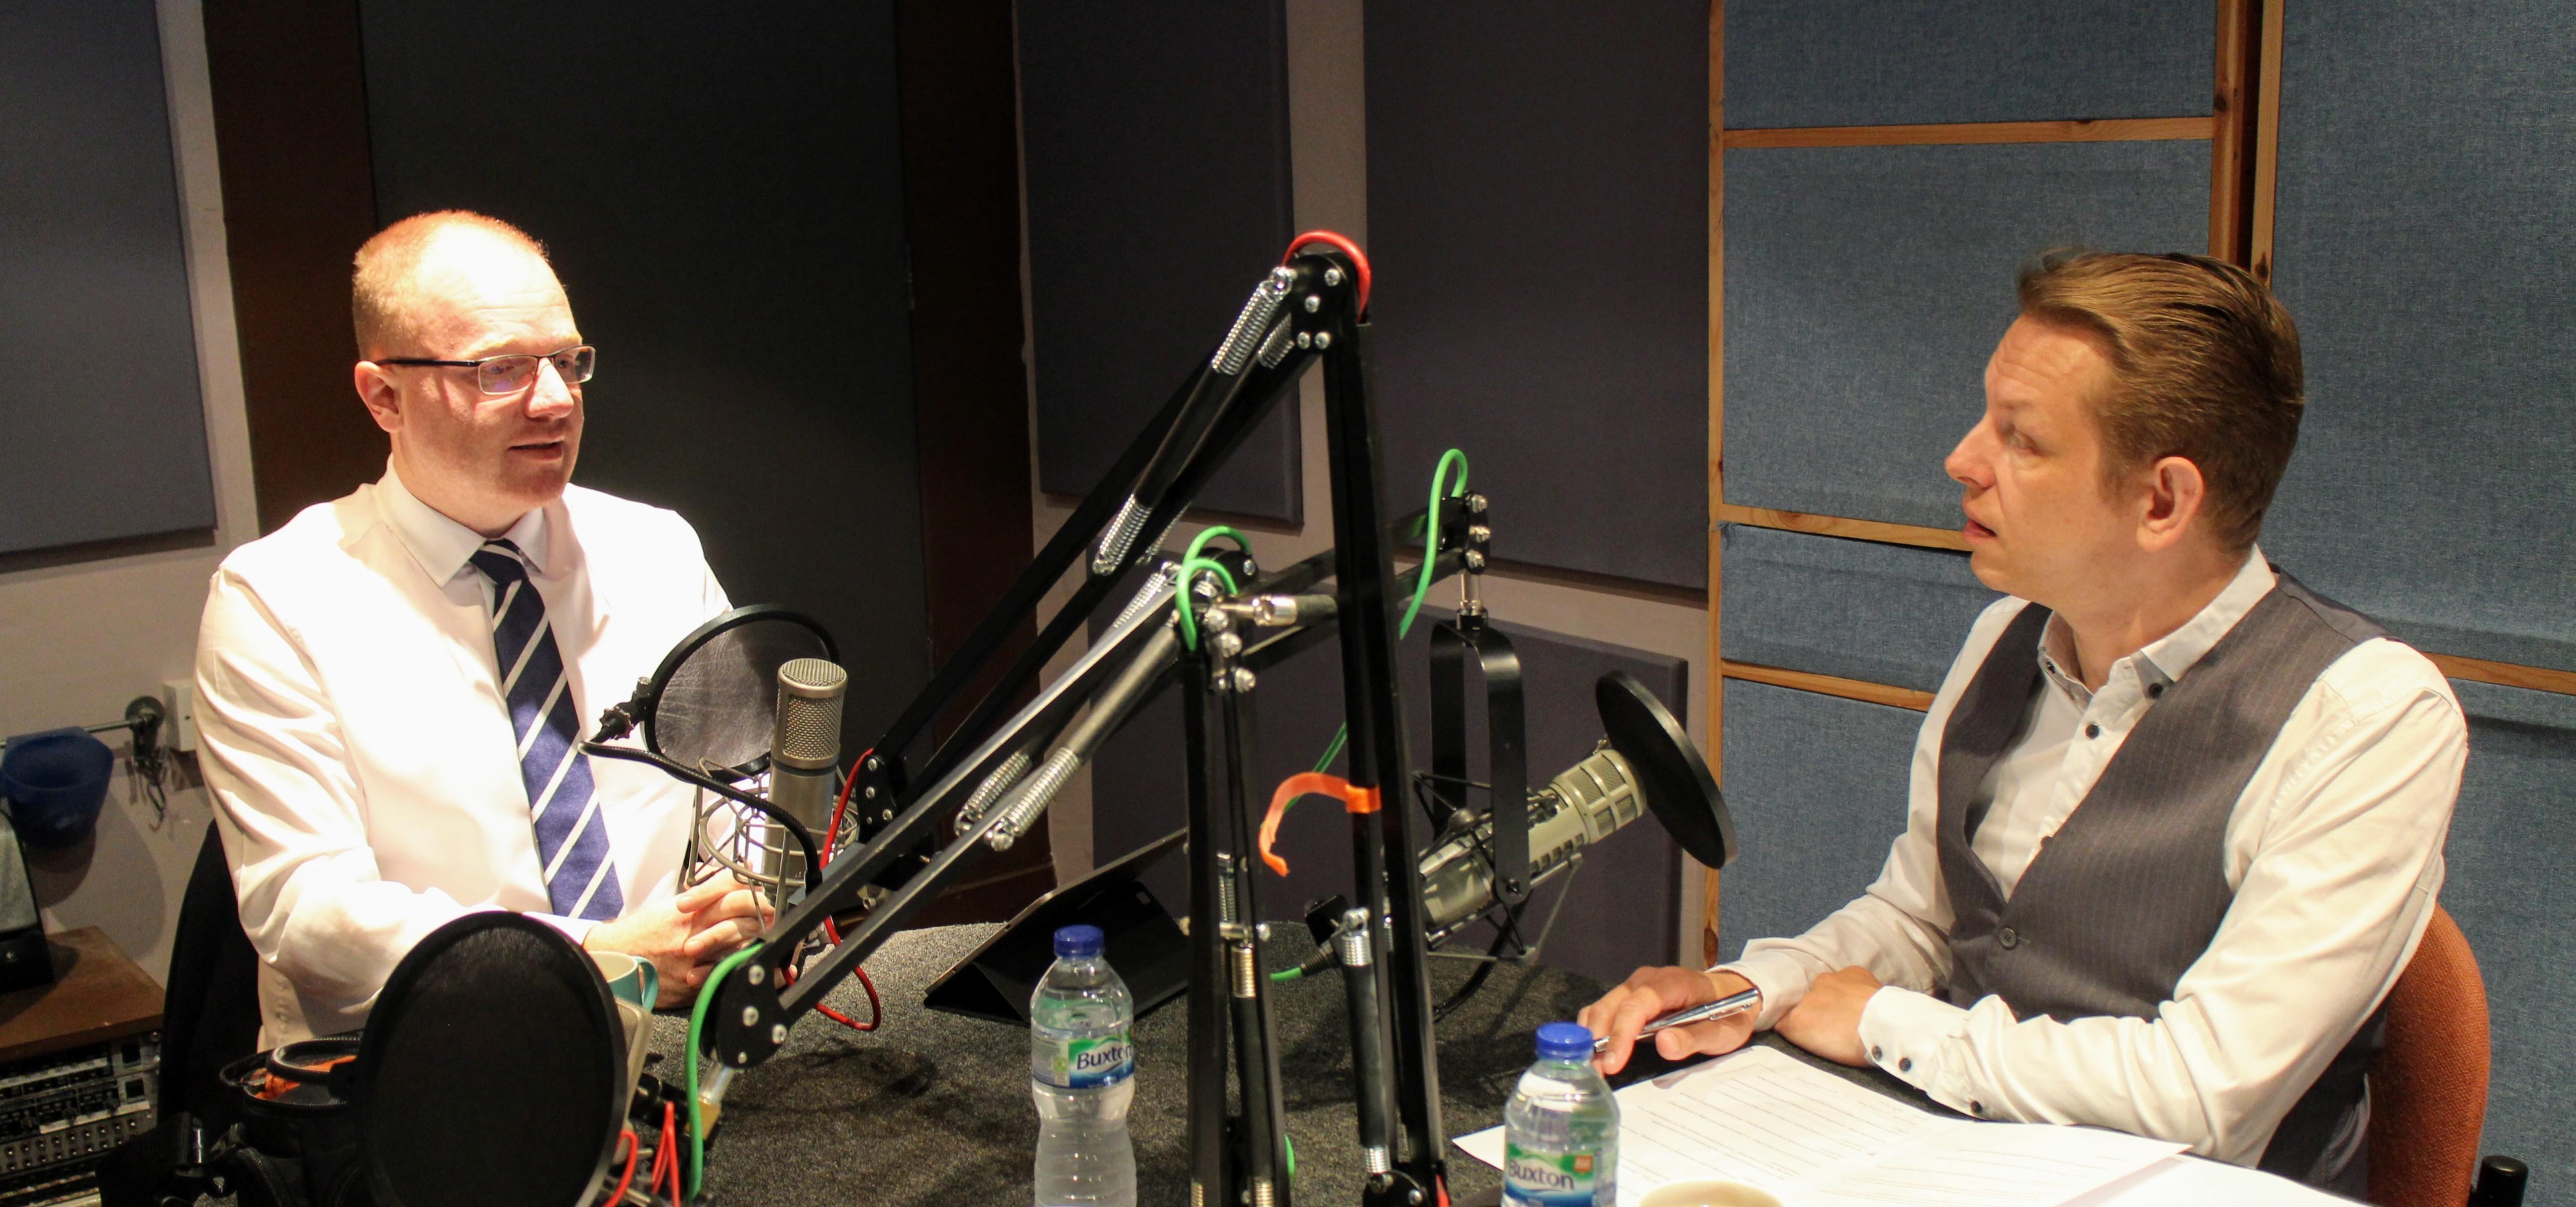 Podcast Production Services - Richard Usher interviews Chris Lunn